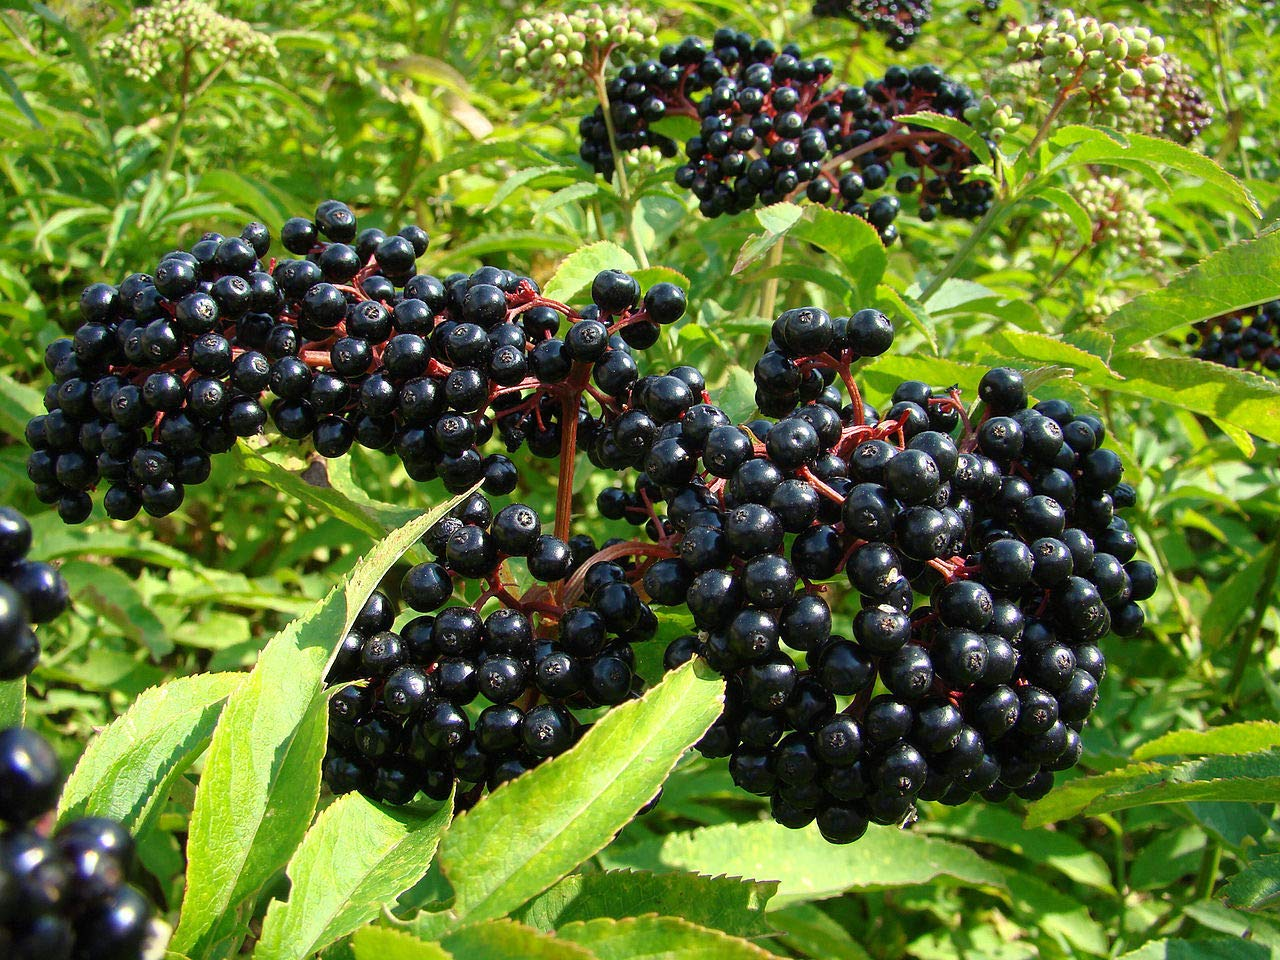 owzoneplant 1 Plant in 2 Gallon Pot Wilder Native Elderberry Bush - Fruit Shrub by owzoneplant (Image #1)